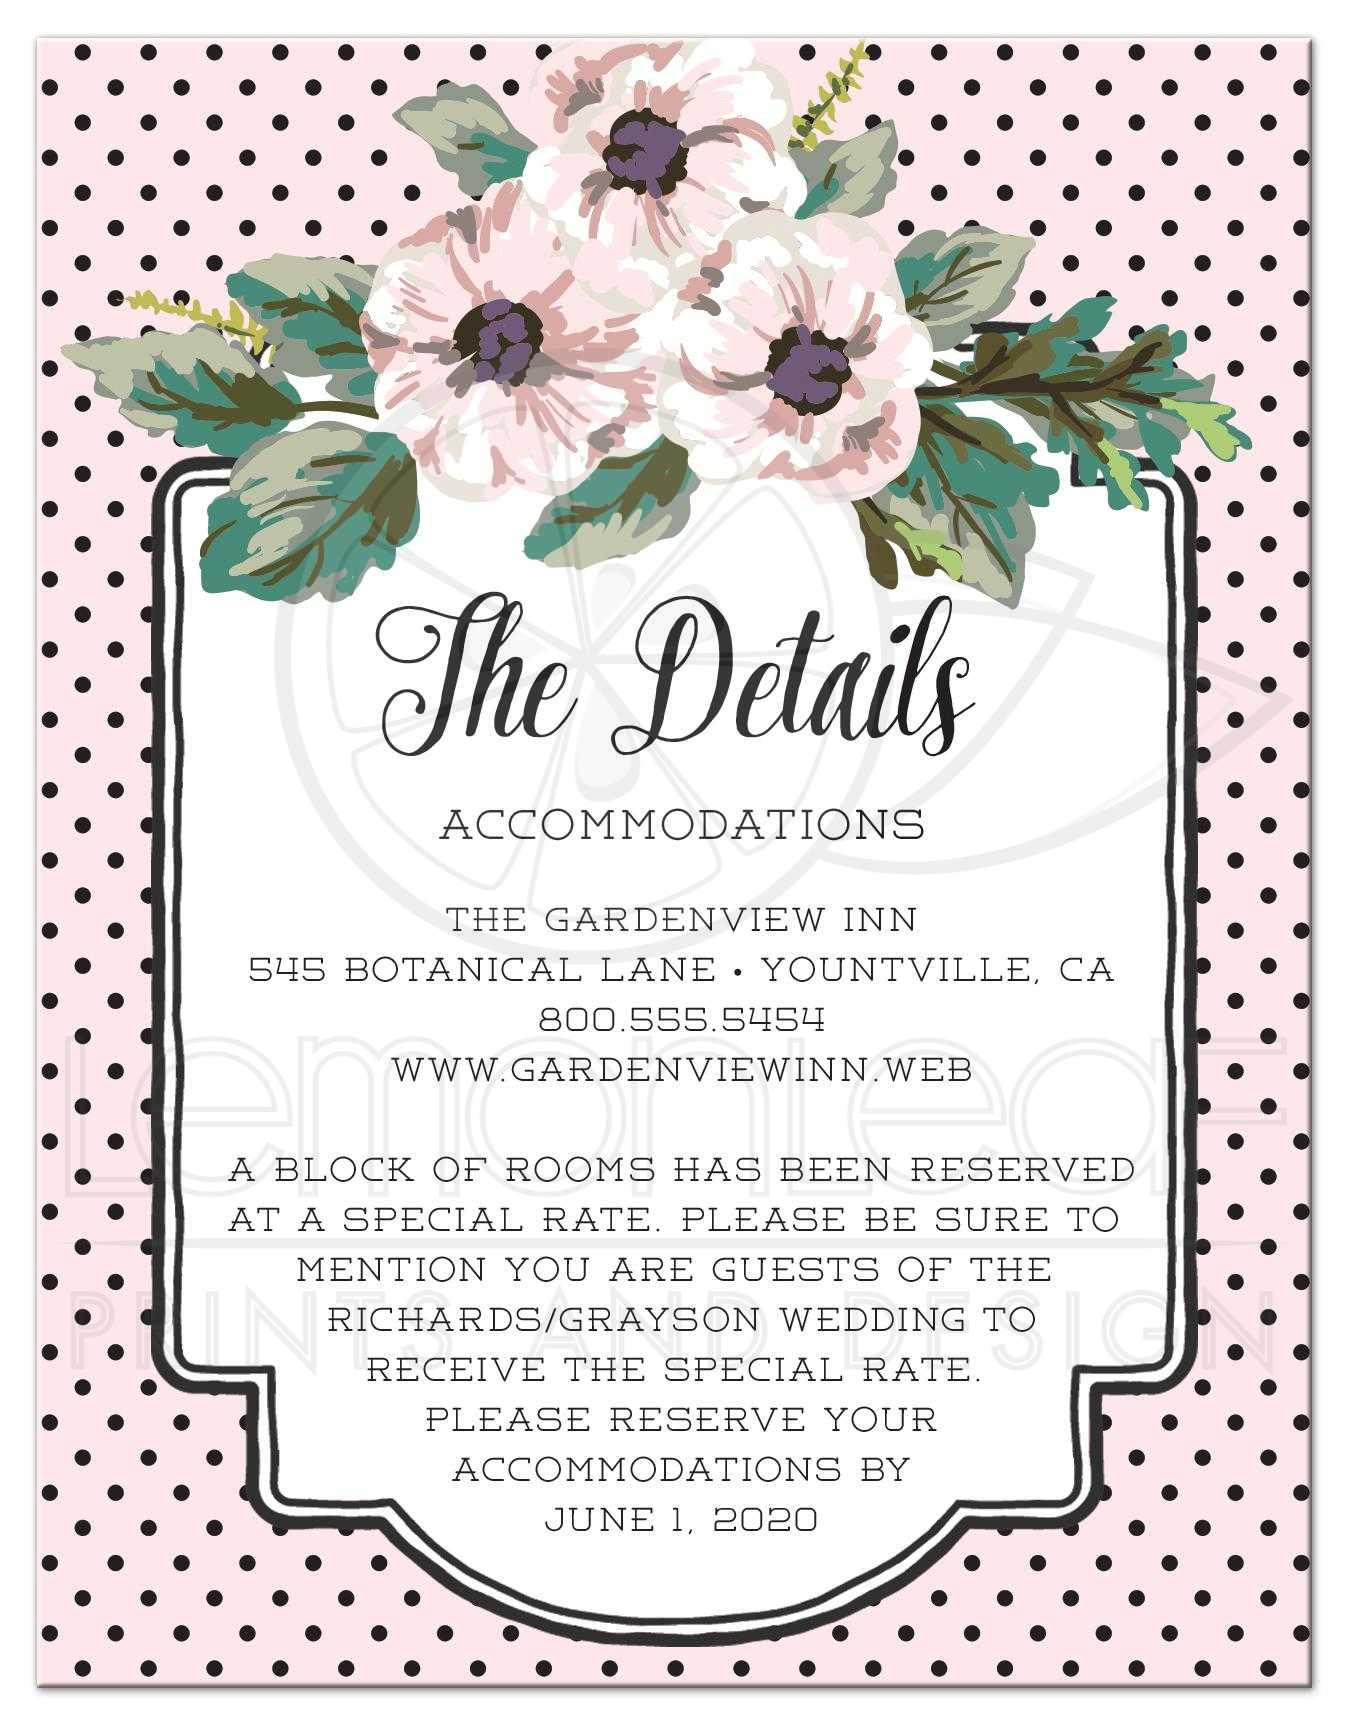 Wedding enclosure cards retro polka dots flowers